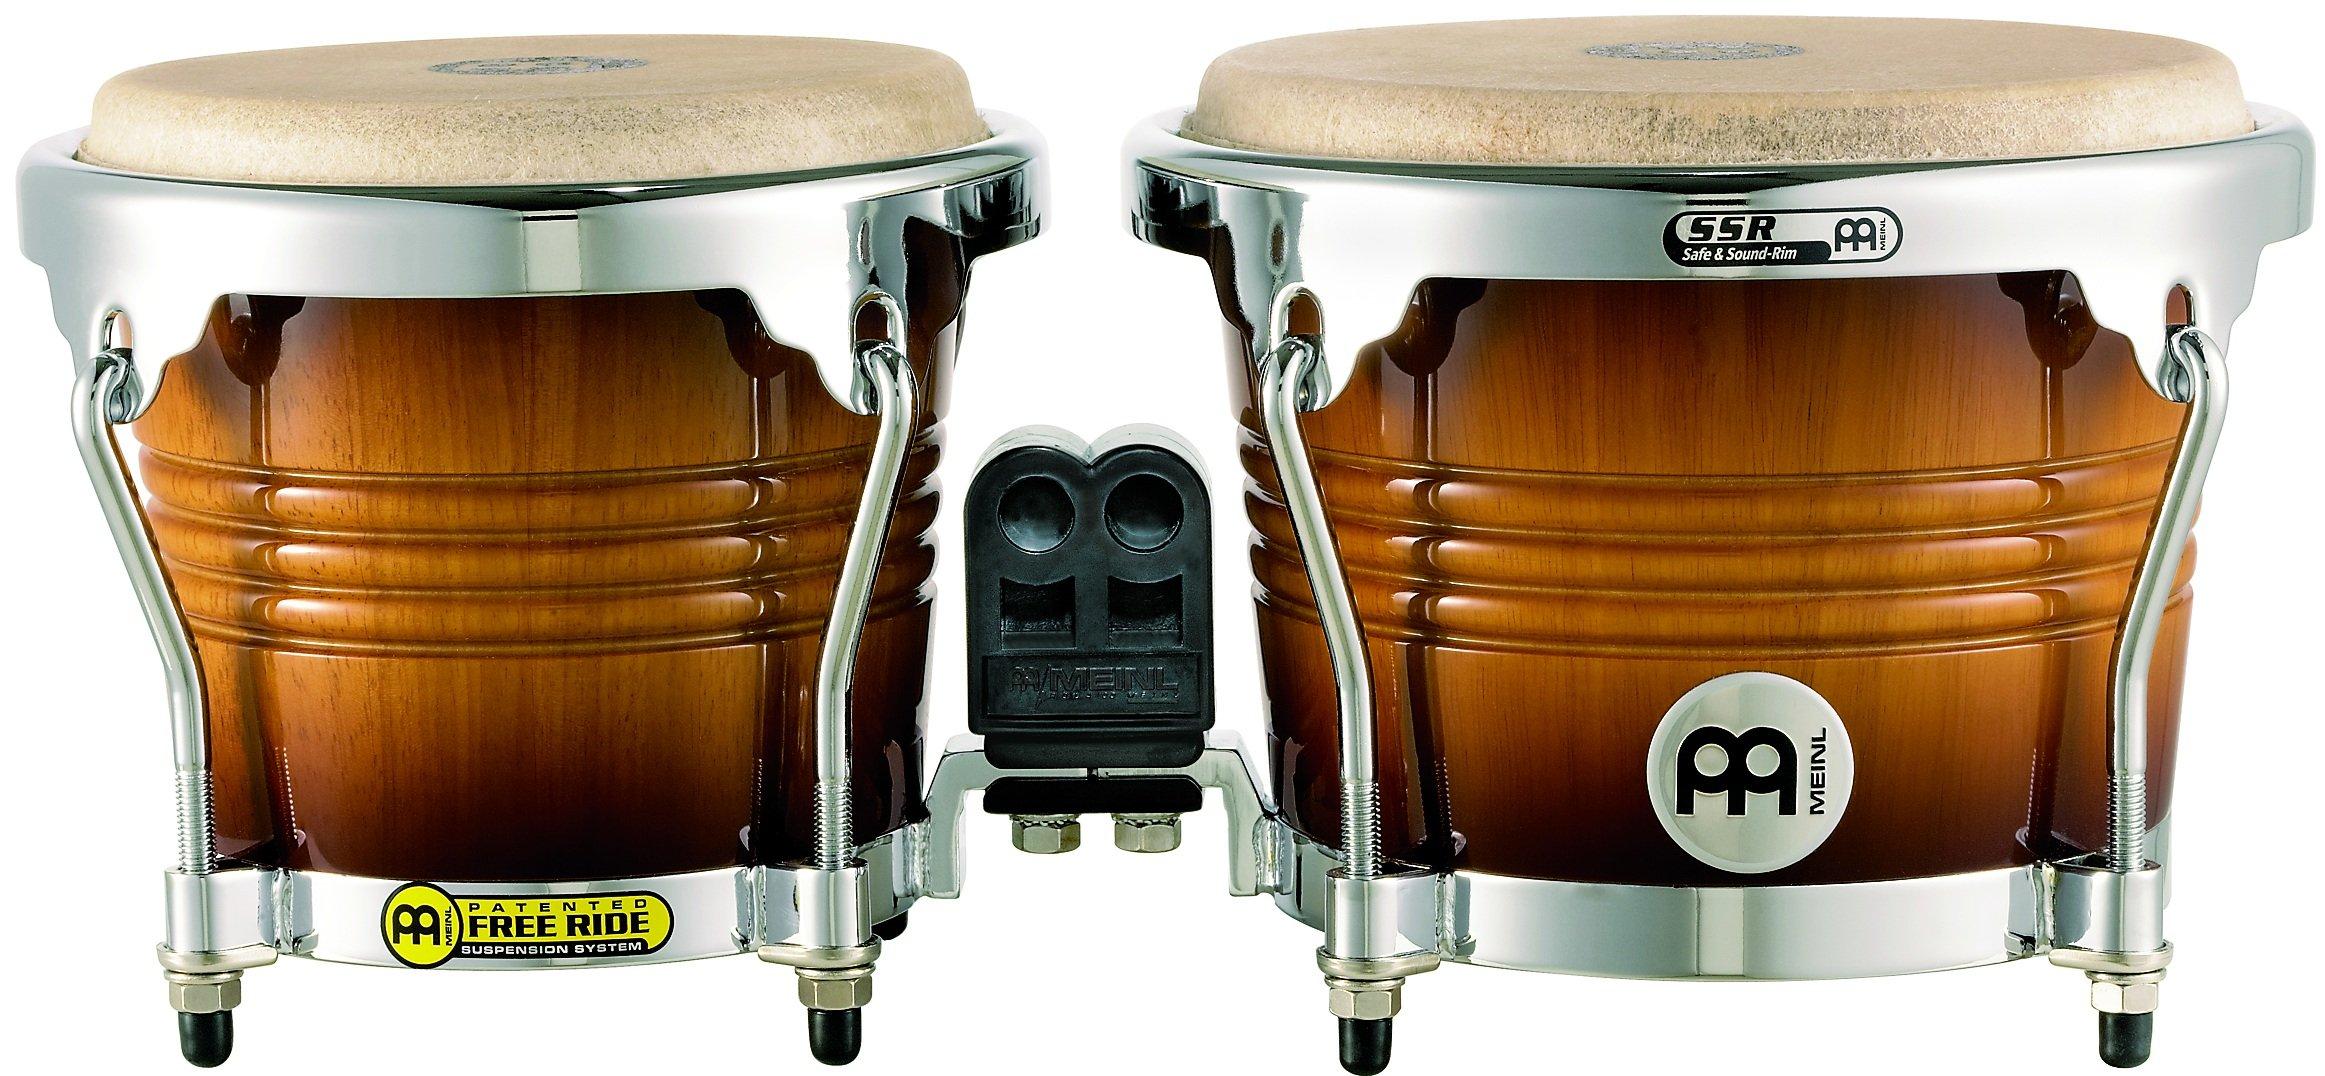 Meinl Percussion FWB200GAB Free Ride Series Wood Bongos, Gold Amber Sunburst Finish by Meinl Percussion